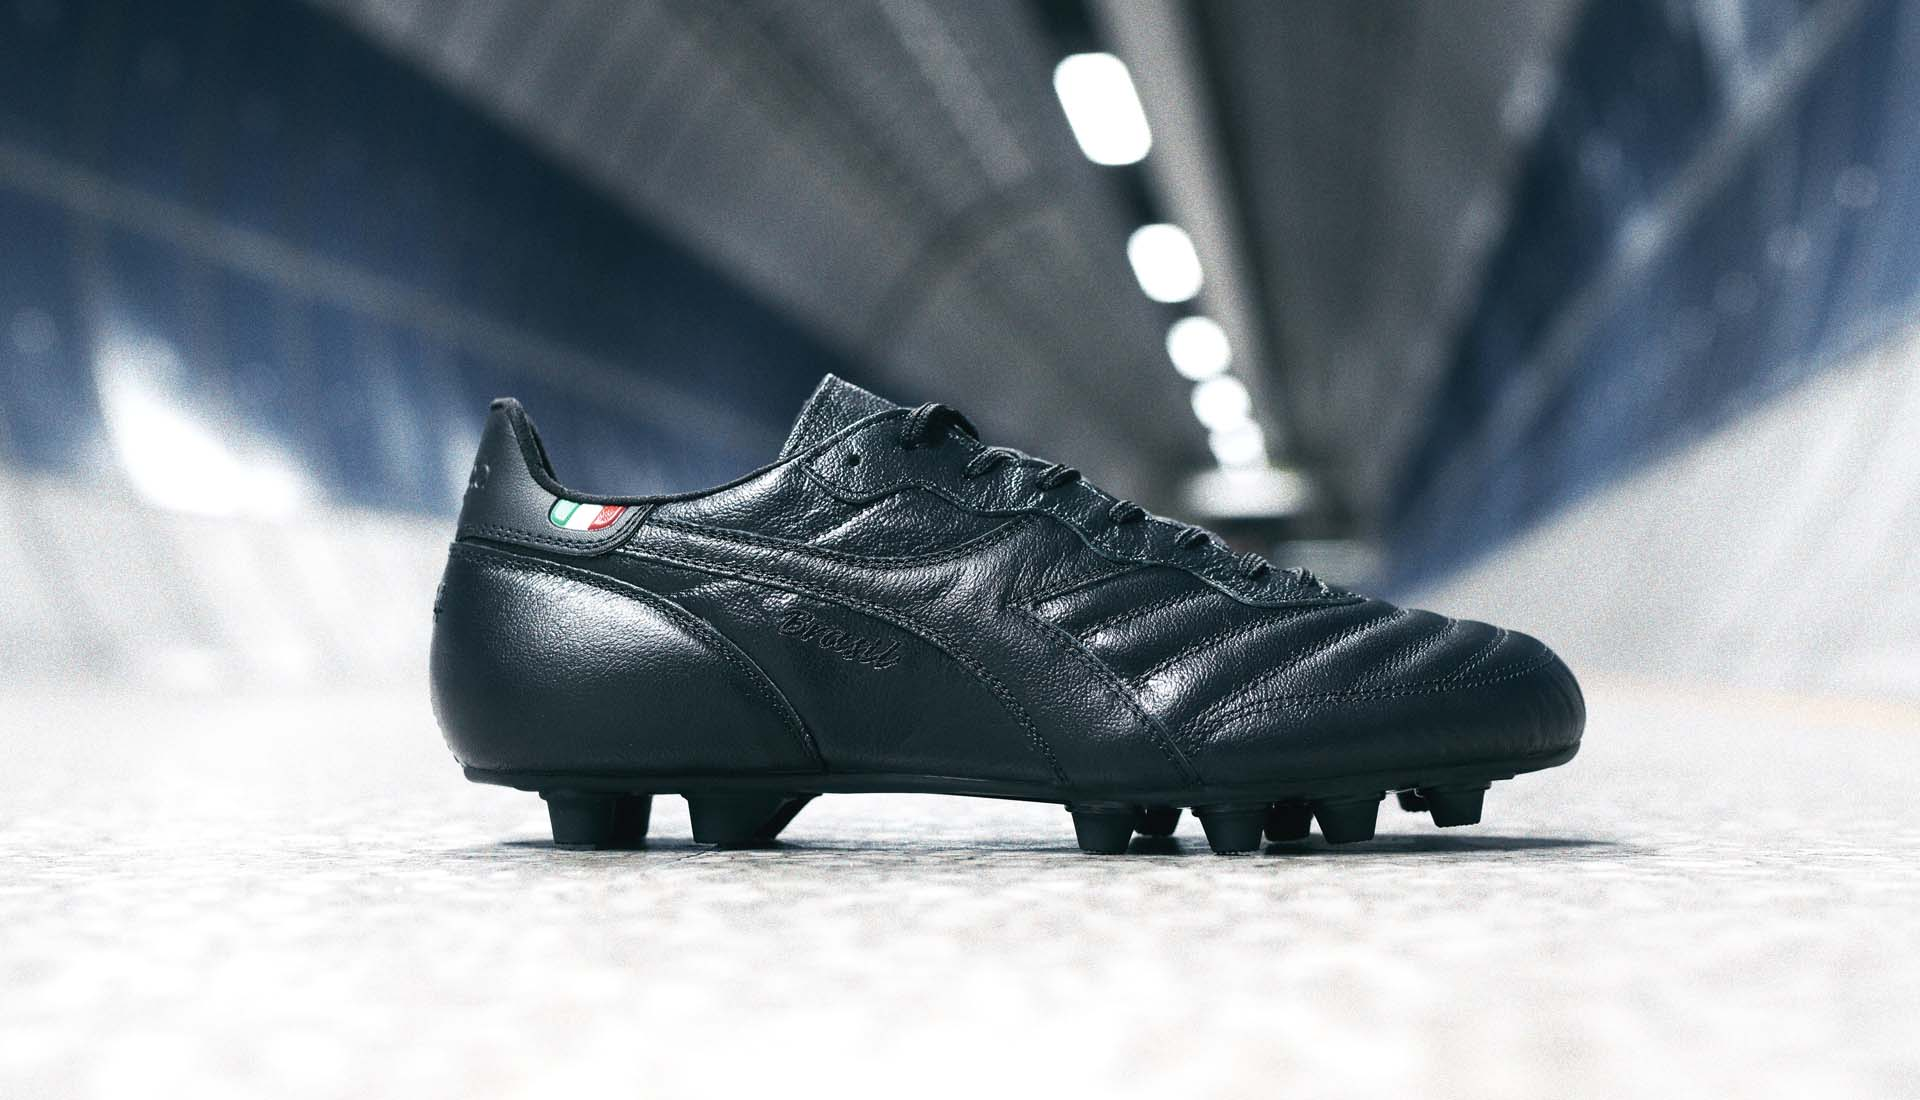 1-diadroa-brasil-blackout-boots-min.jpg